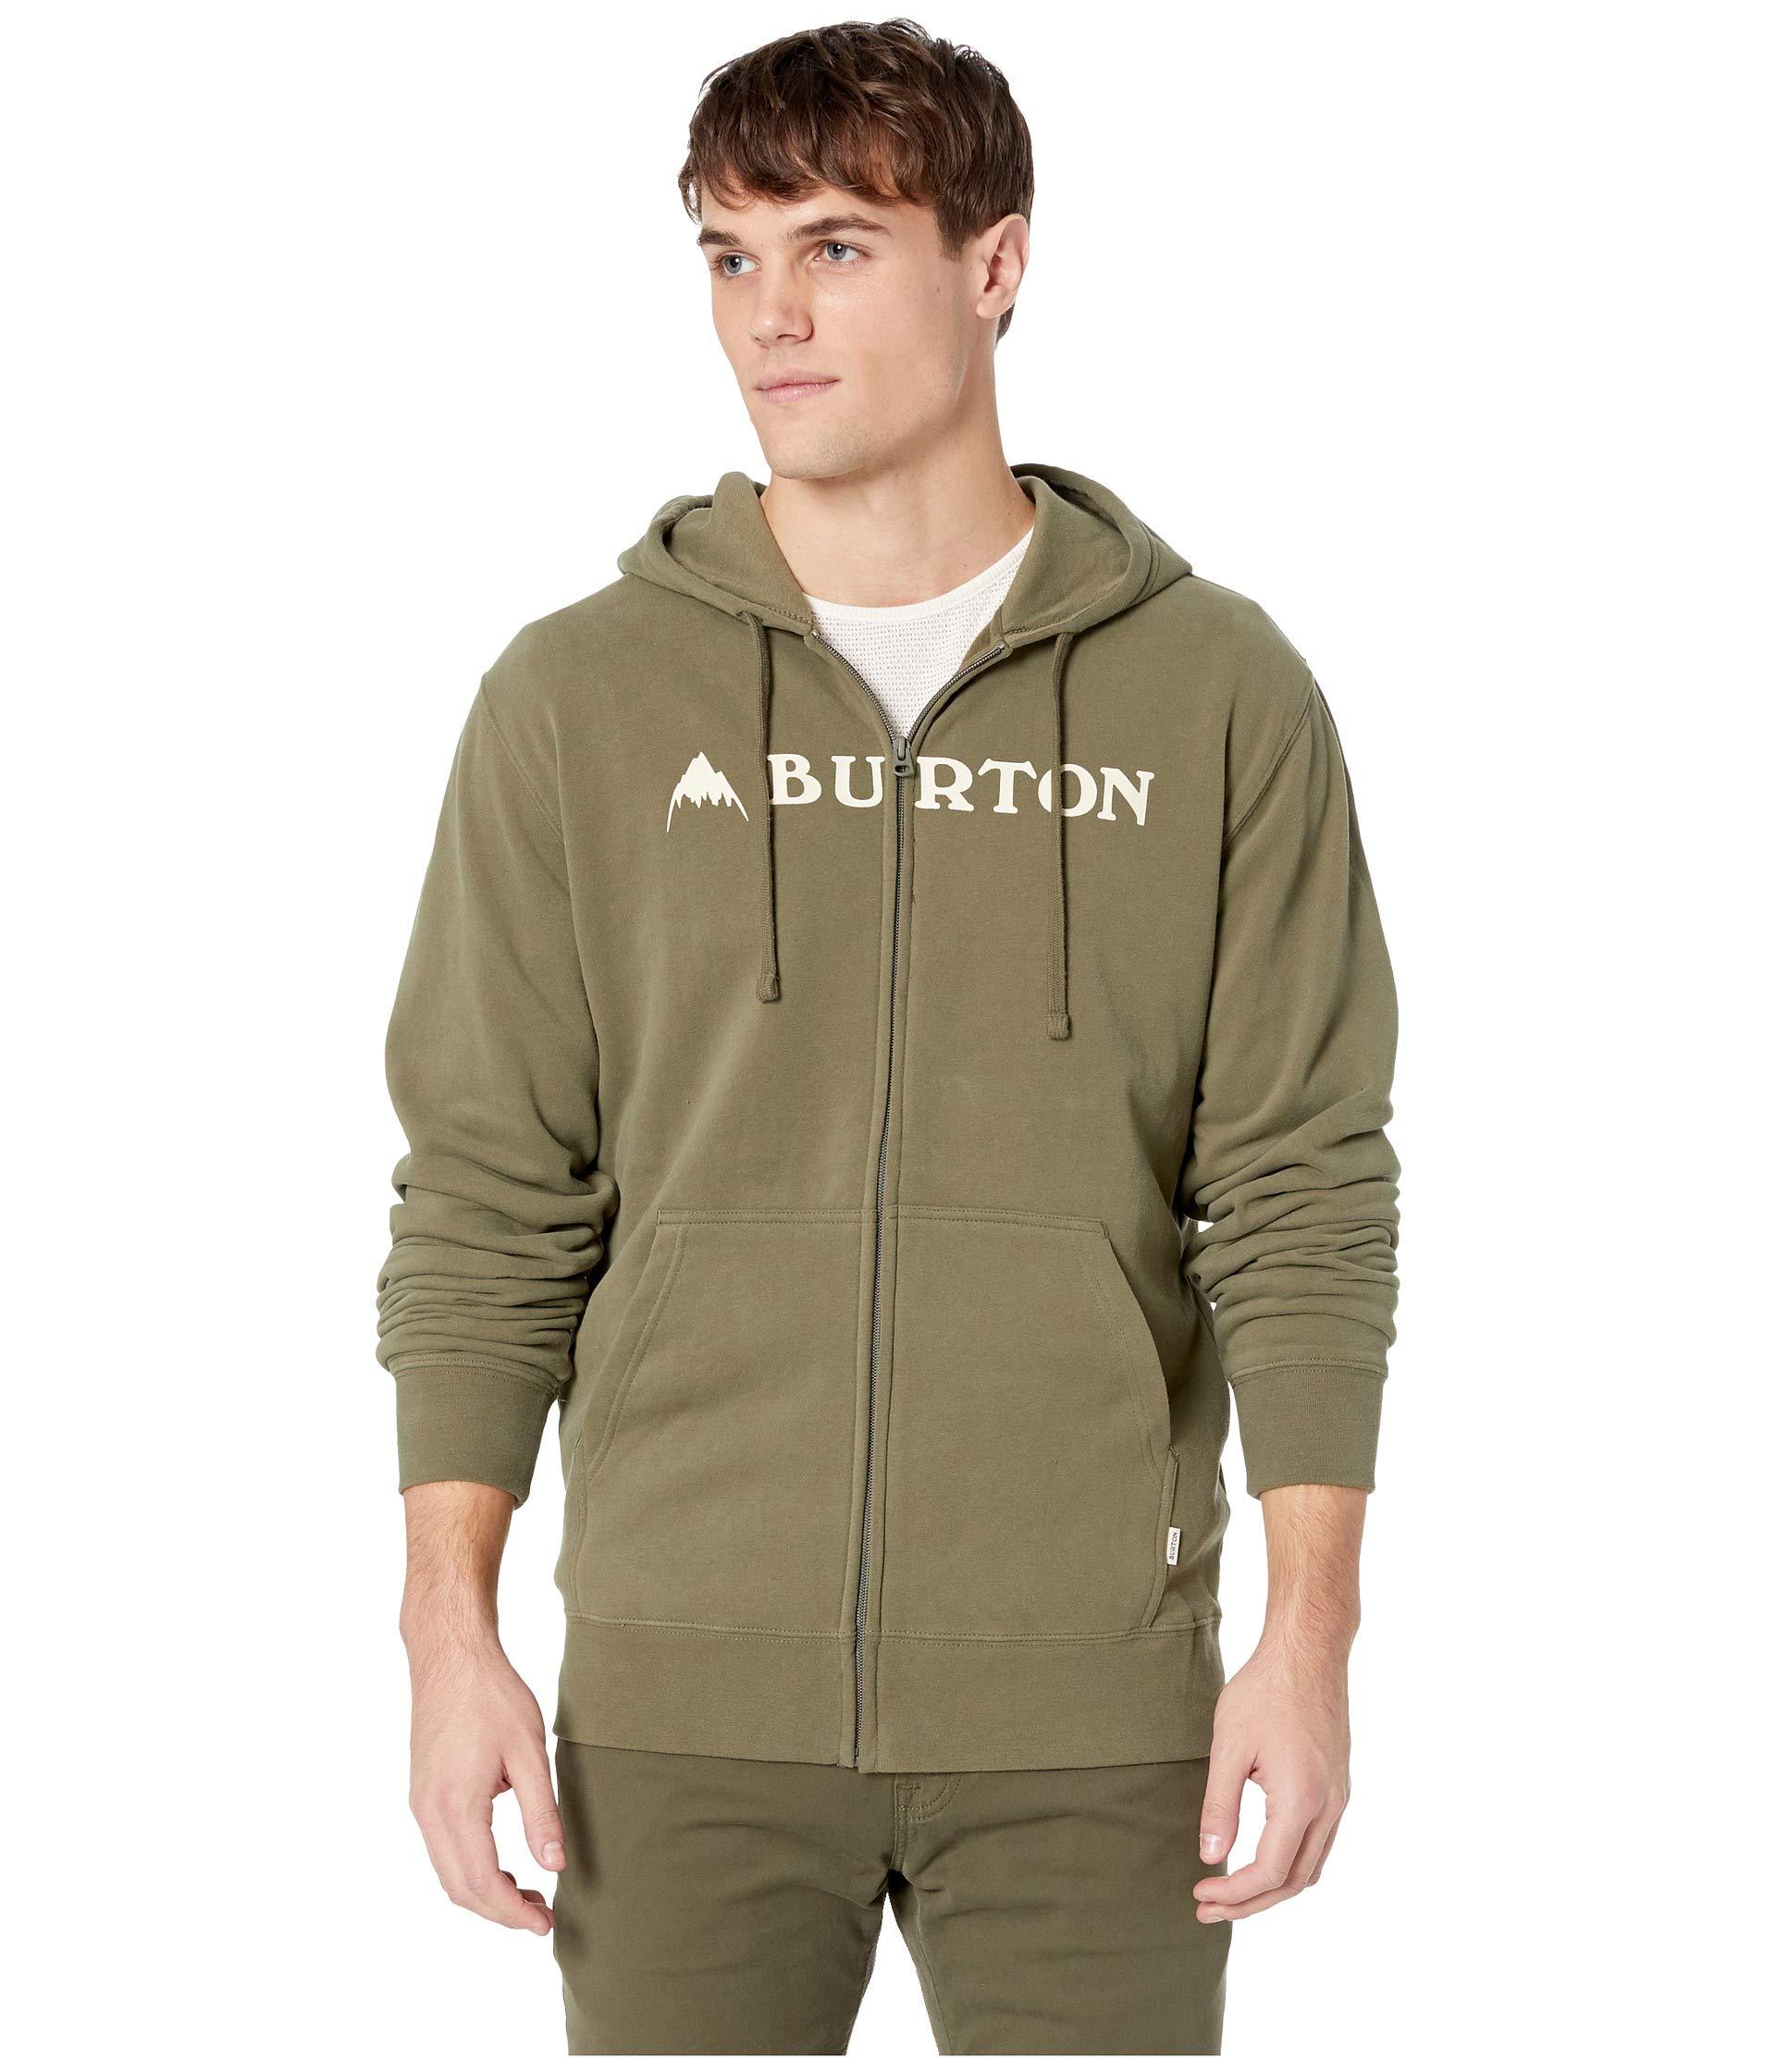 Horizontal Dusty Full Mountain Burton Zip Olive Hoodie Sw7d0qxEX